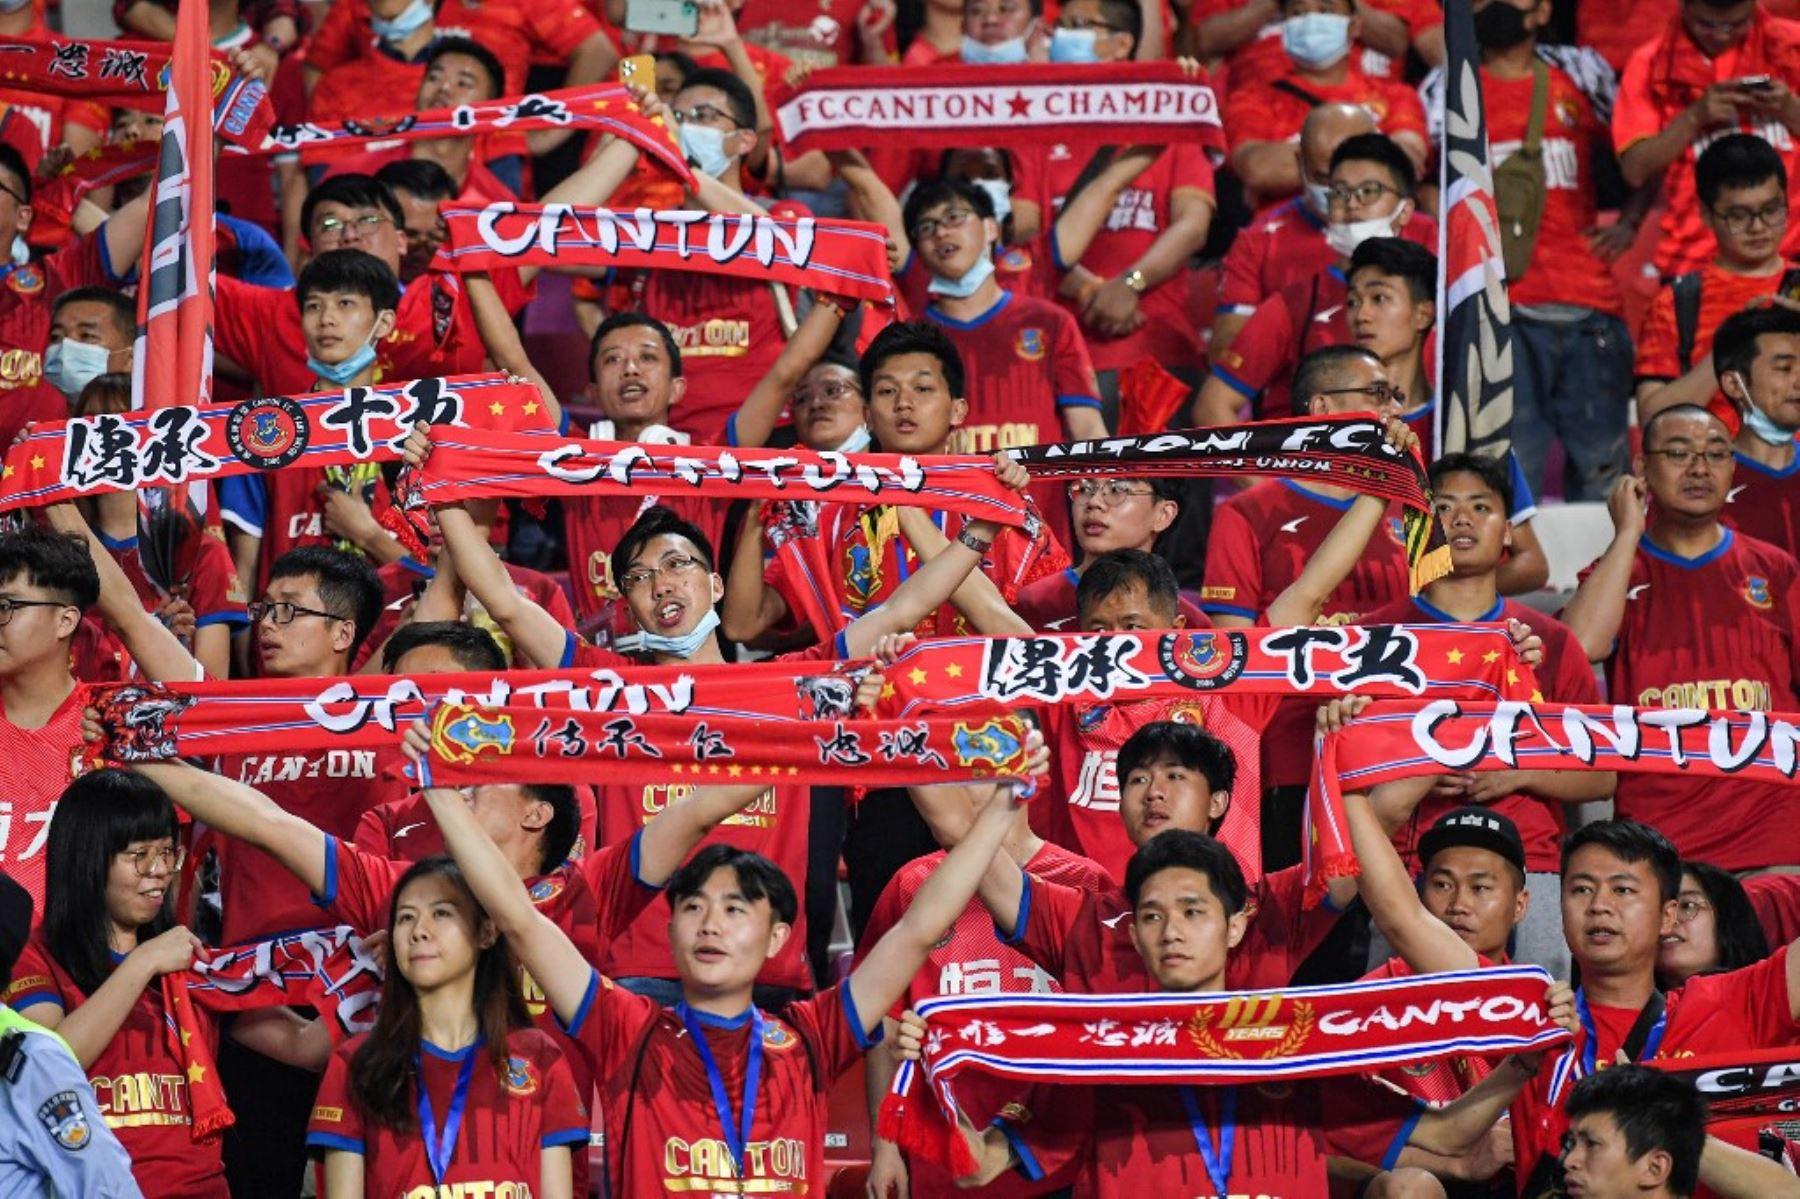 Liga China inició con presencia de 30 mil espectadores en estadio